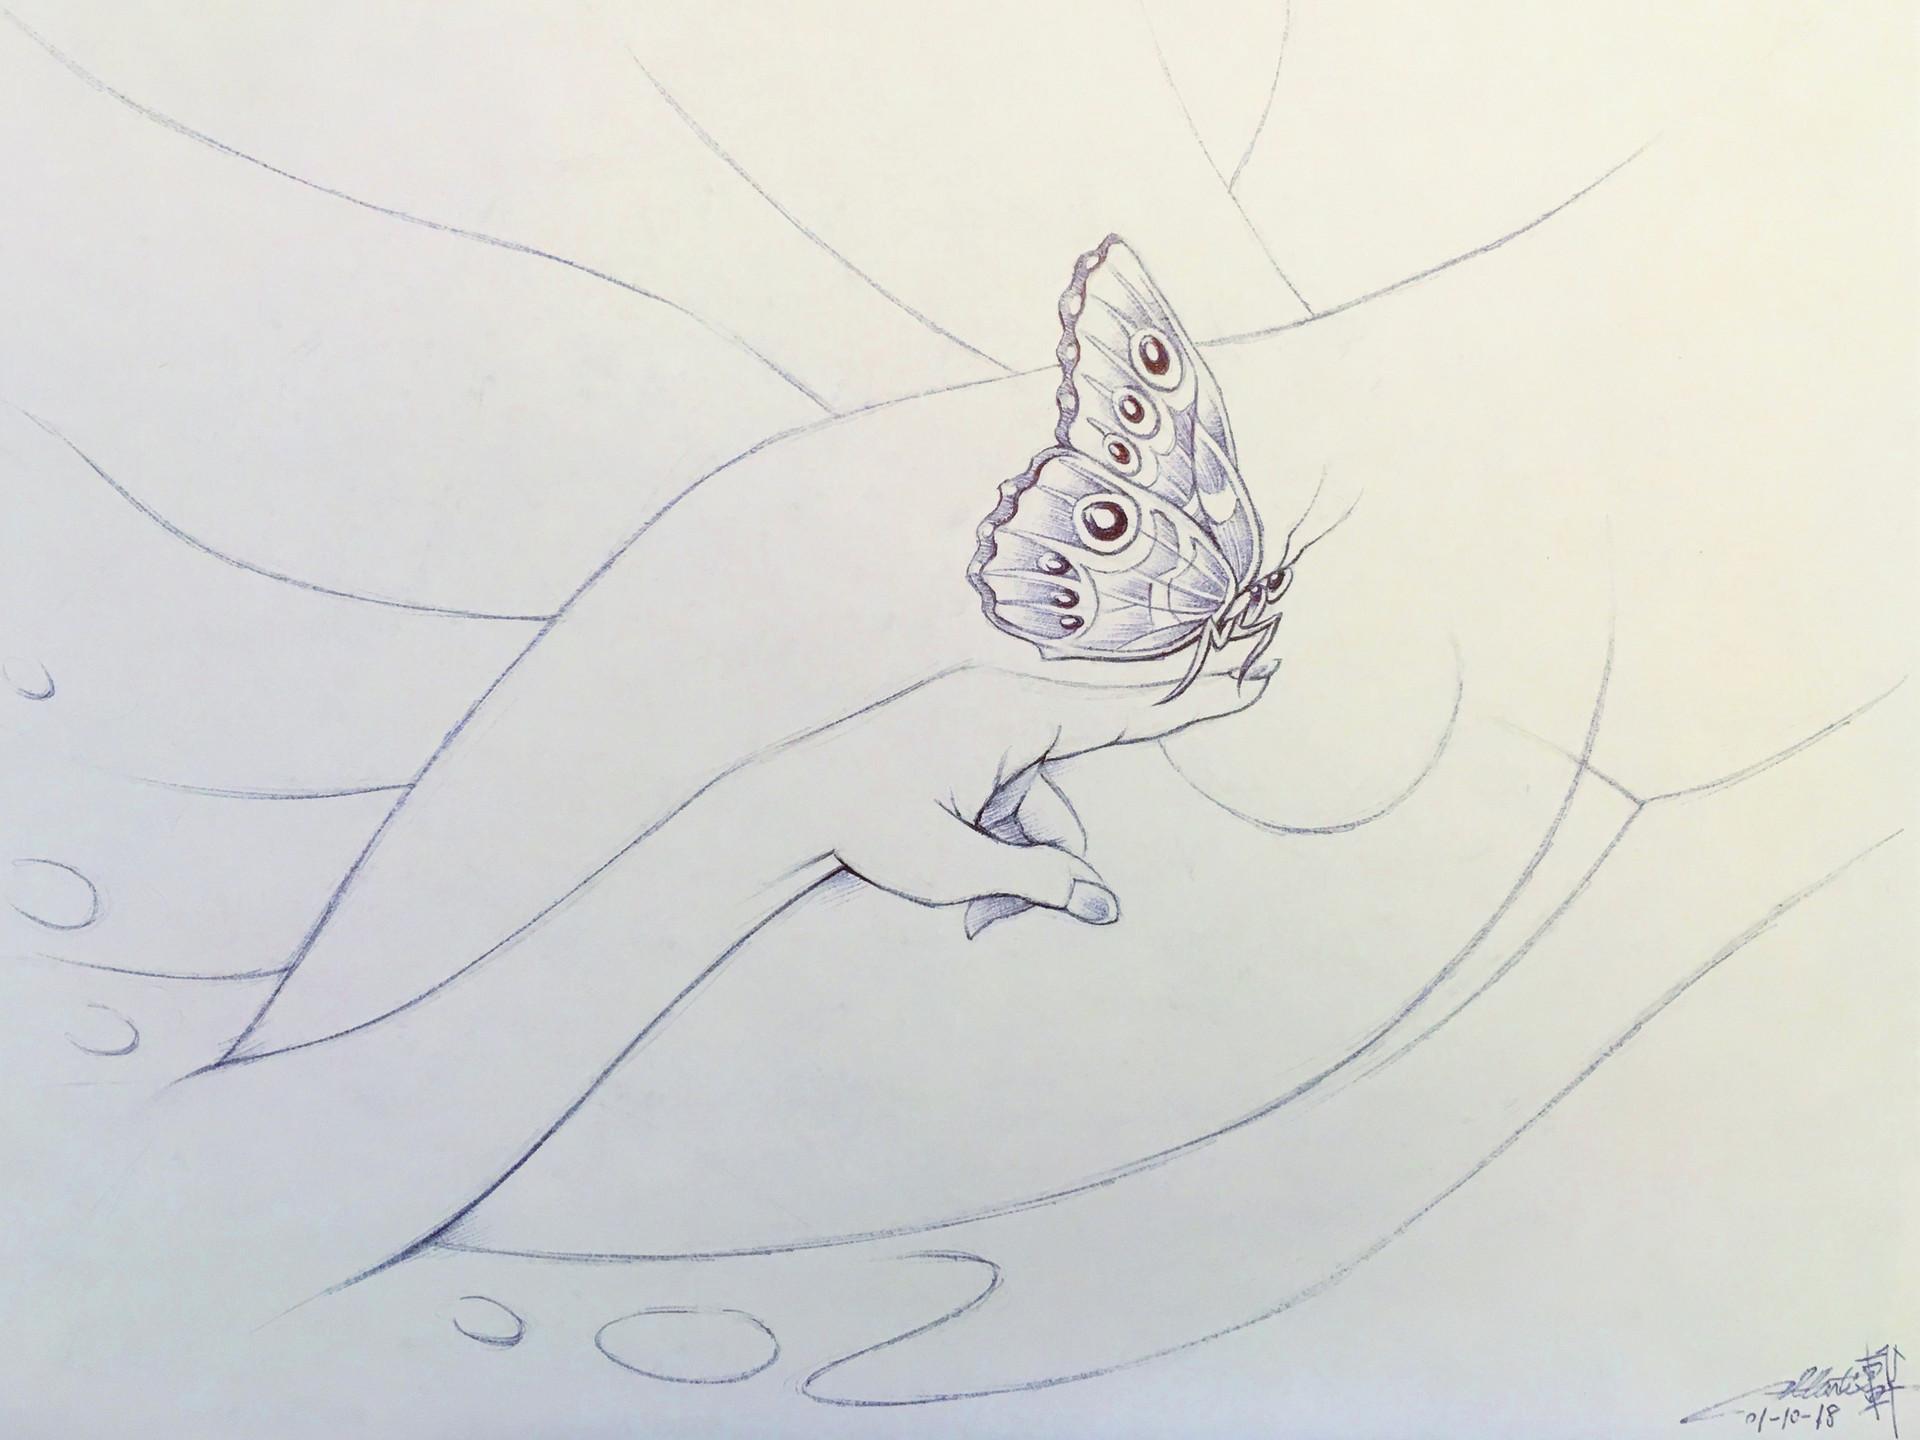 E lynx bluemorpho 011018a